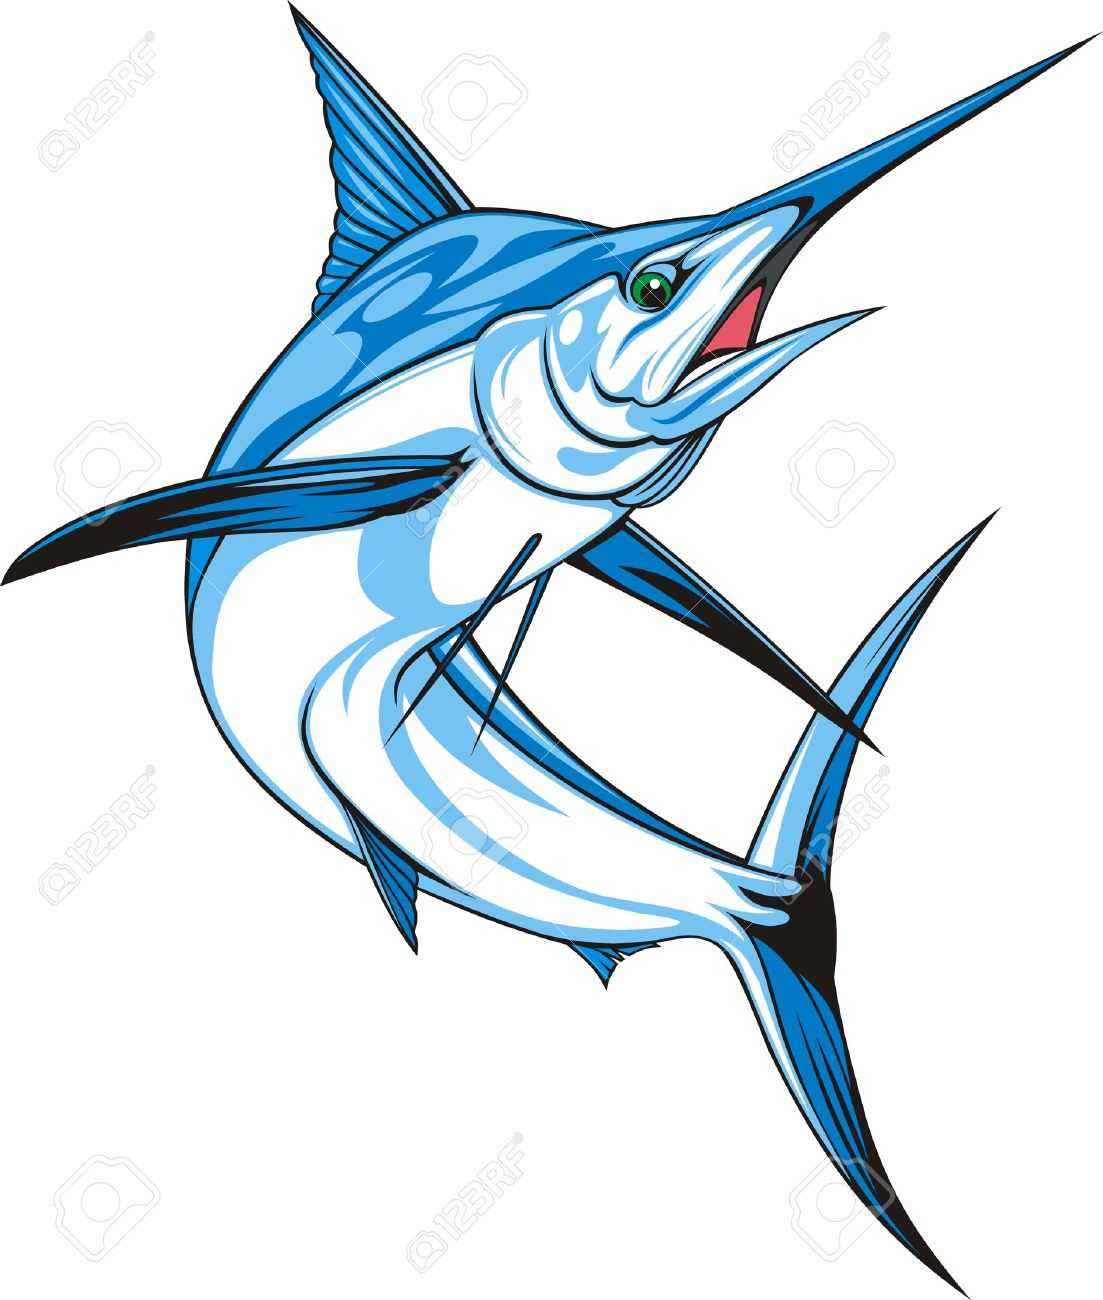 1103x1300 Fish Clipart Blue Marlin